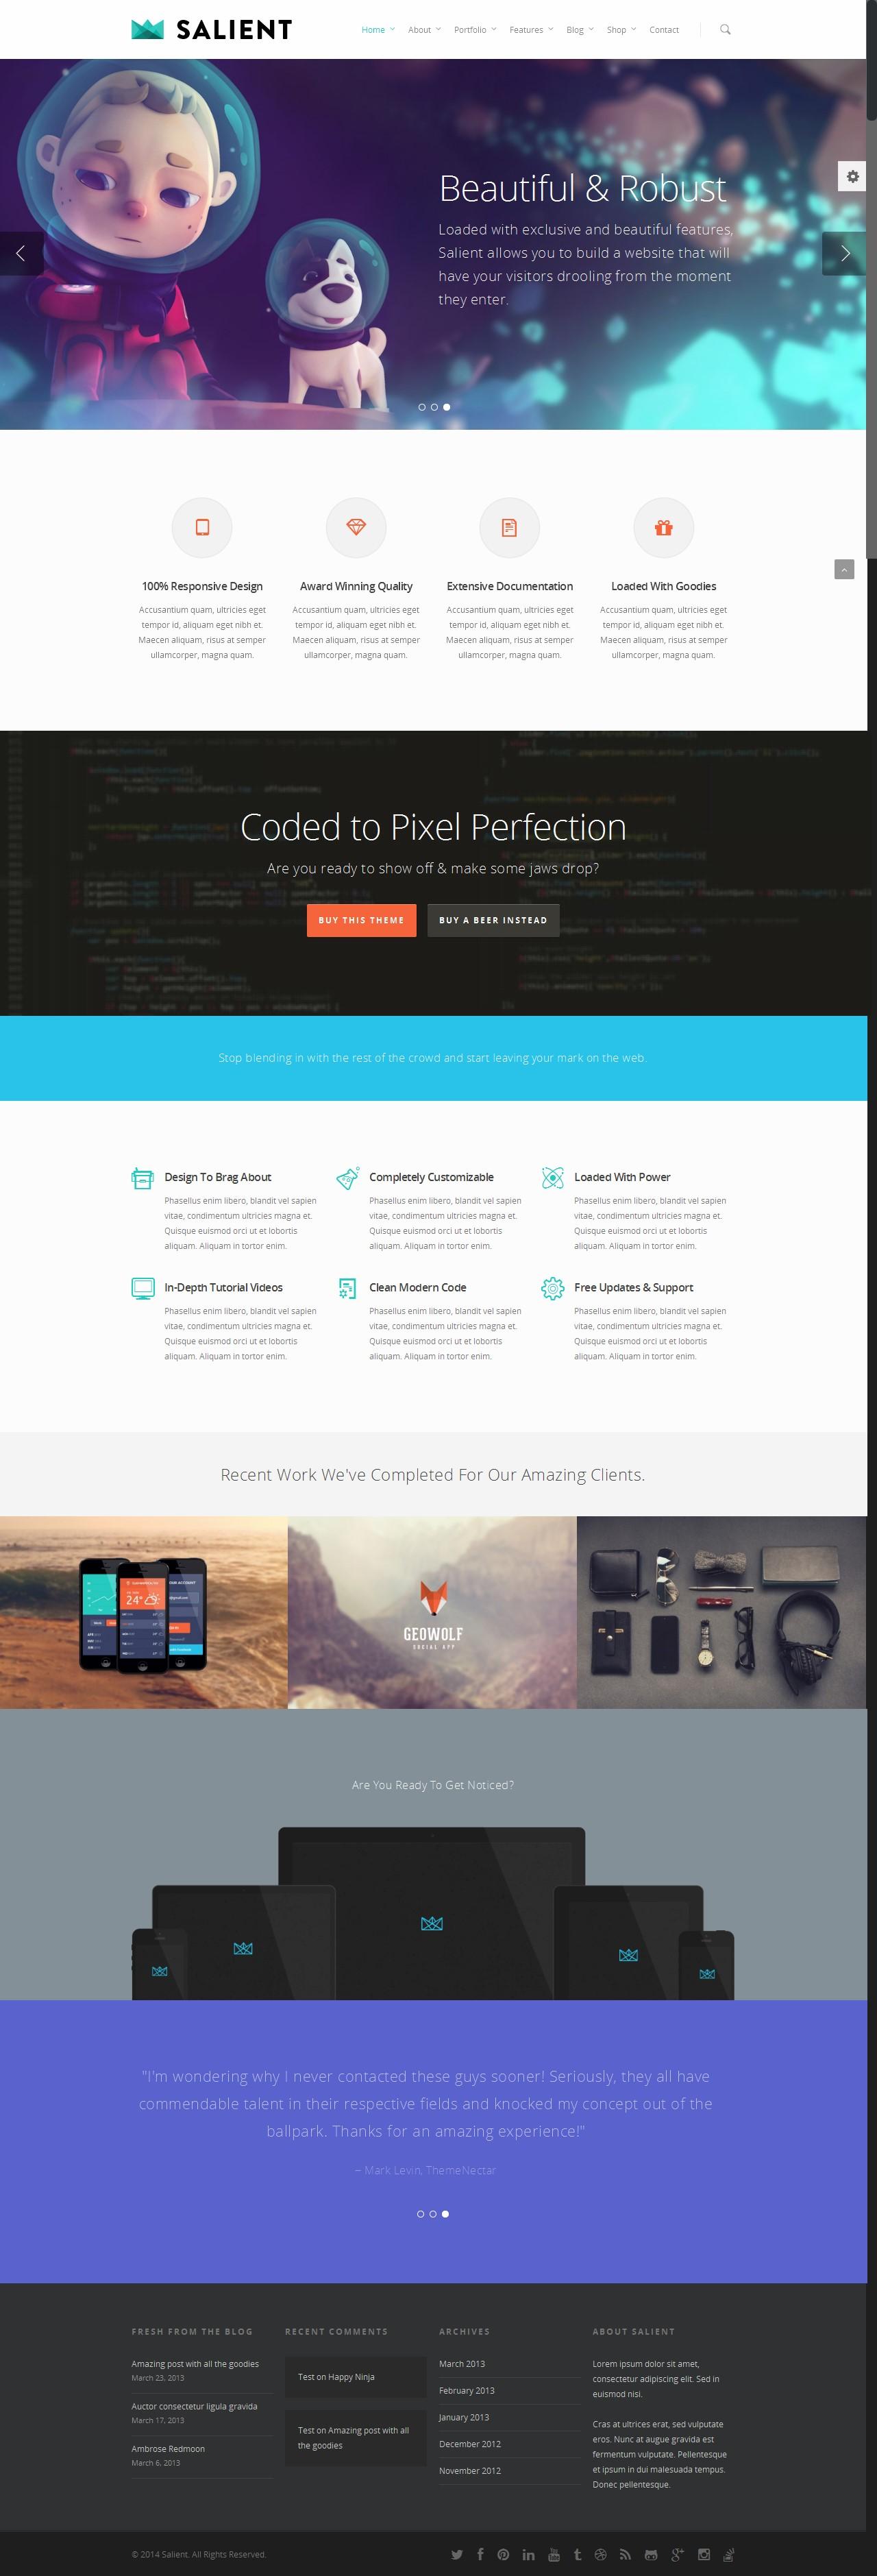 Salient-multipurpose-wordpress-theme-16